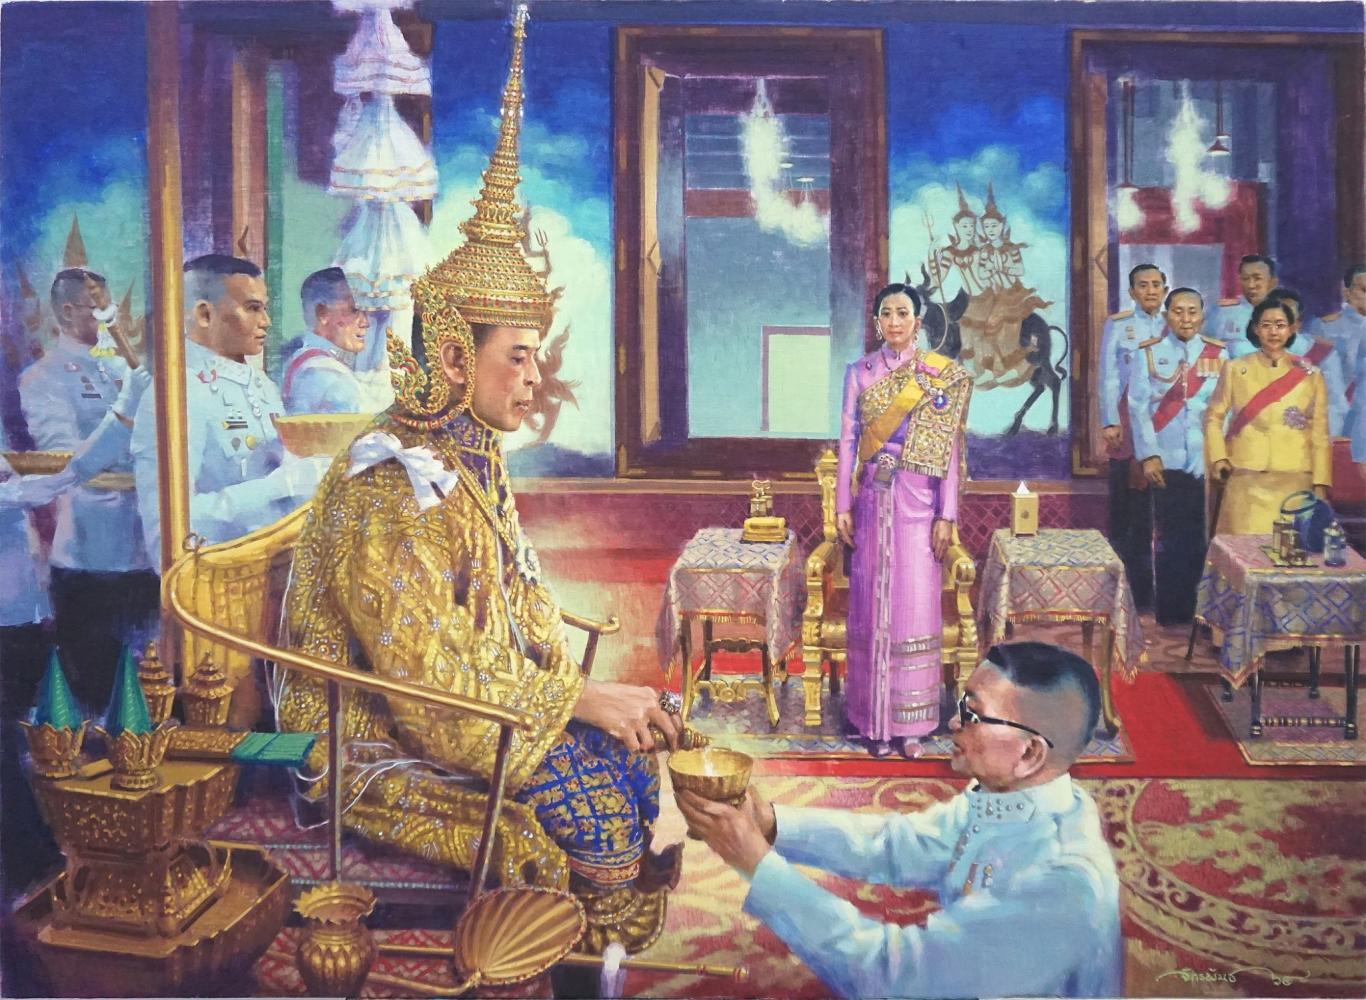 Celebrate the King's birthday through online art exhibition